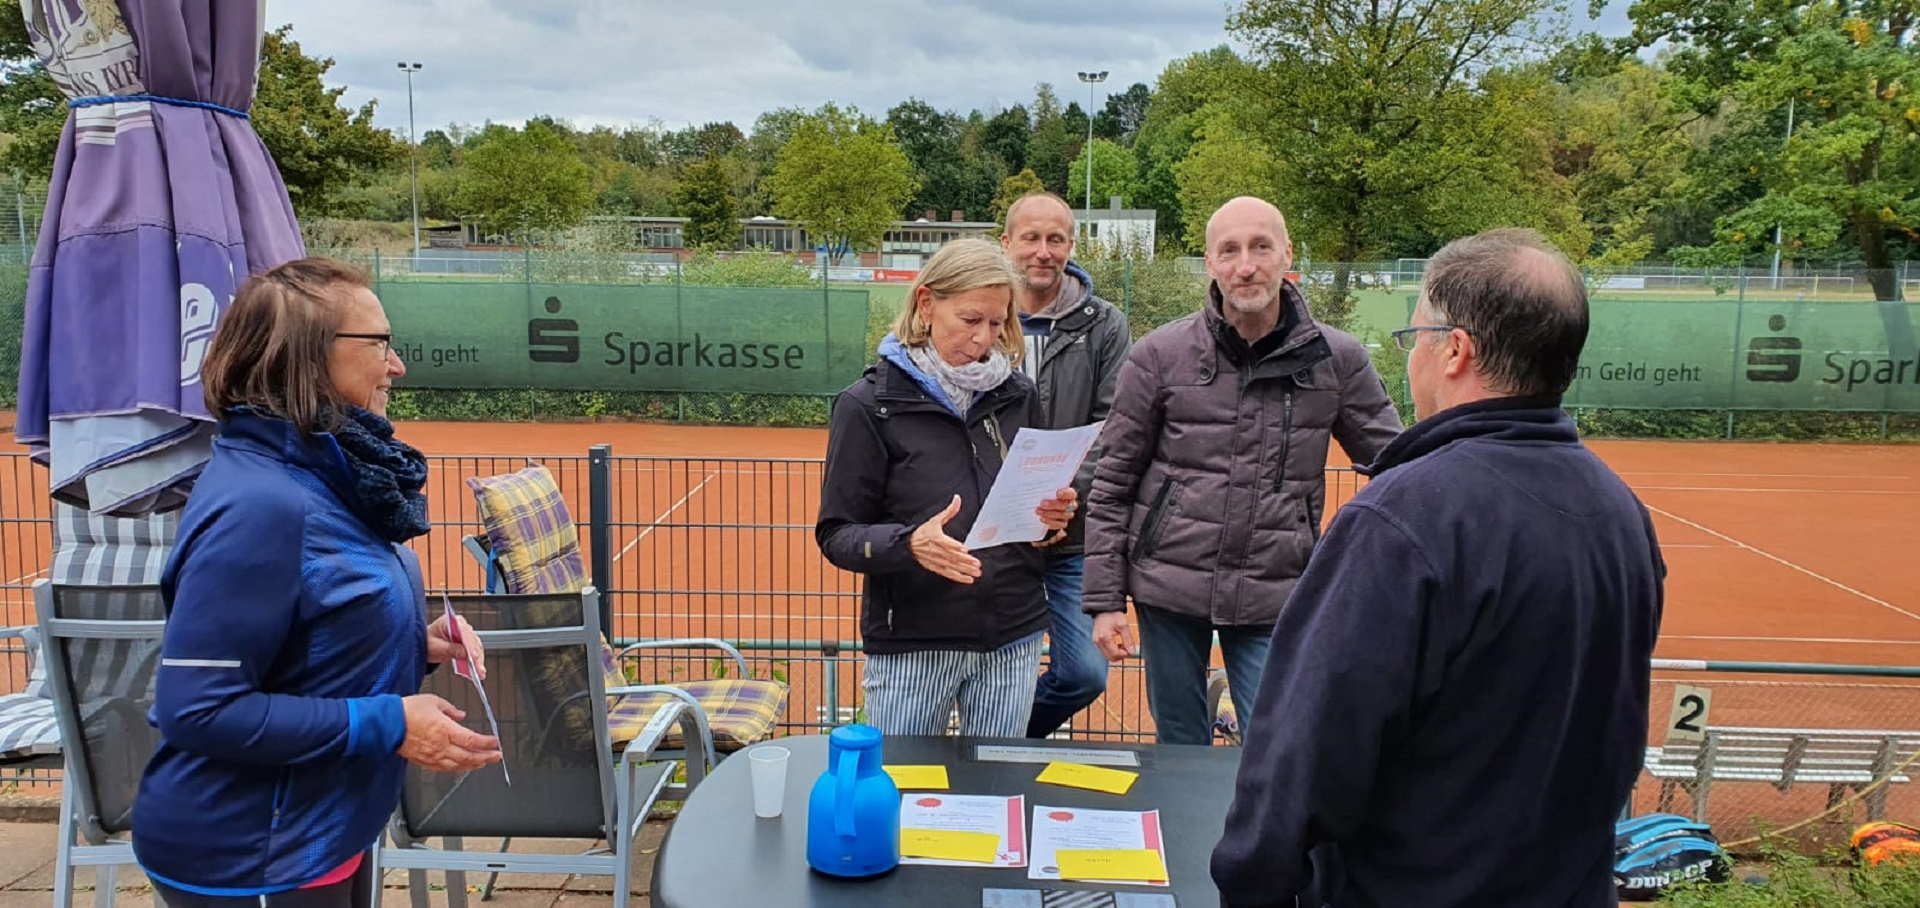 telekom-post-sv-bielefeld-tennisabteilung-vereinsmeisterschaften-2020-siegerehrung-1-hp